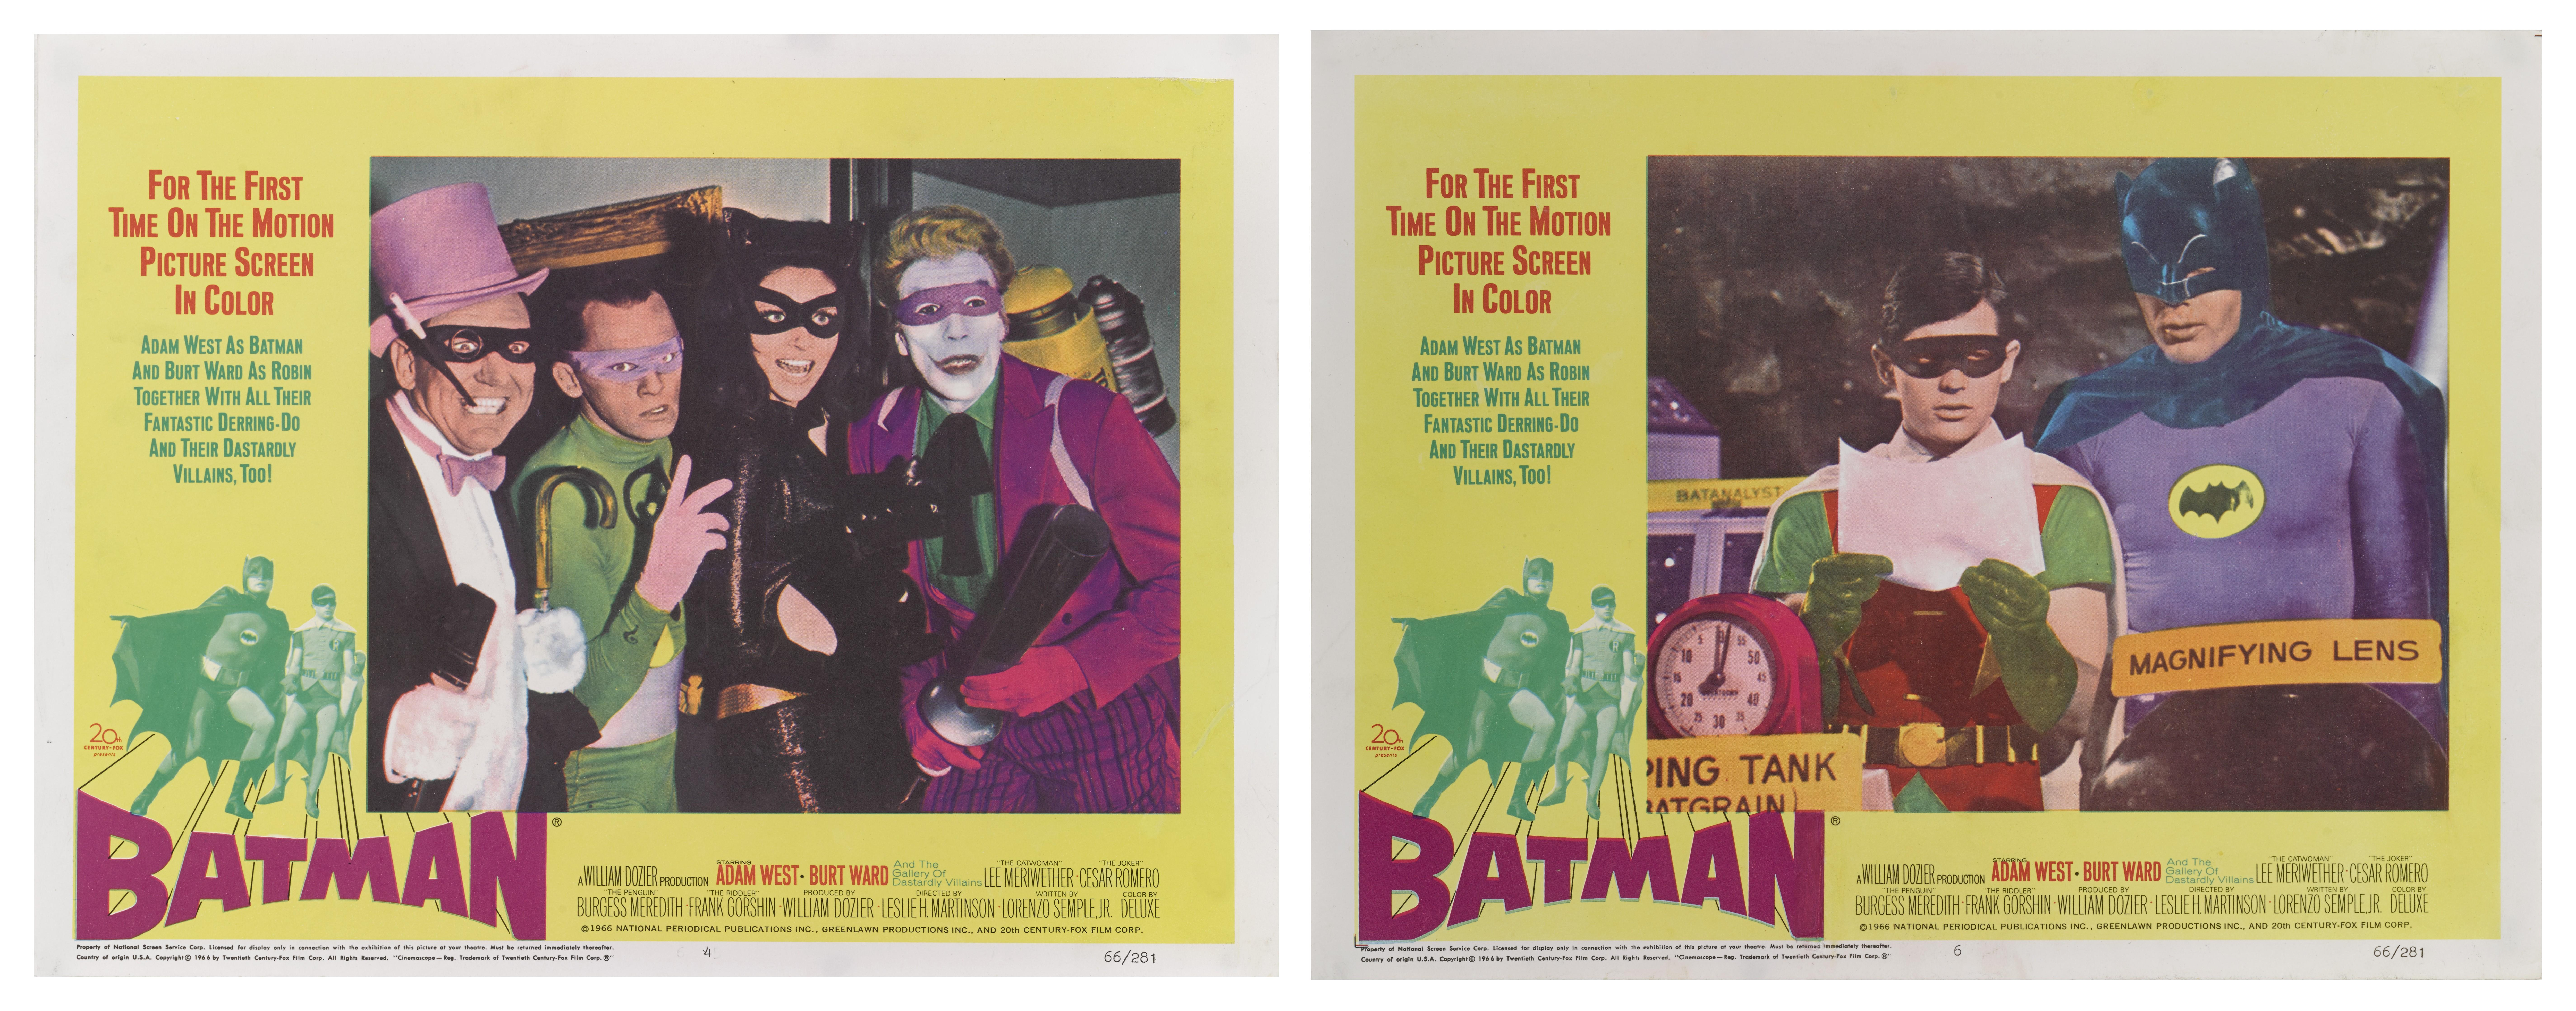 TWO BATMAN (1966) LOBBY CARDS, US